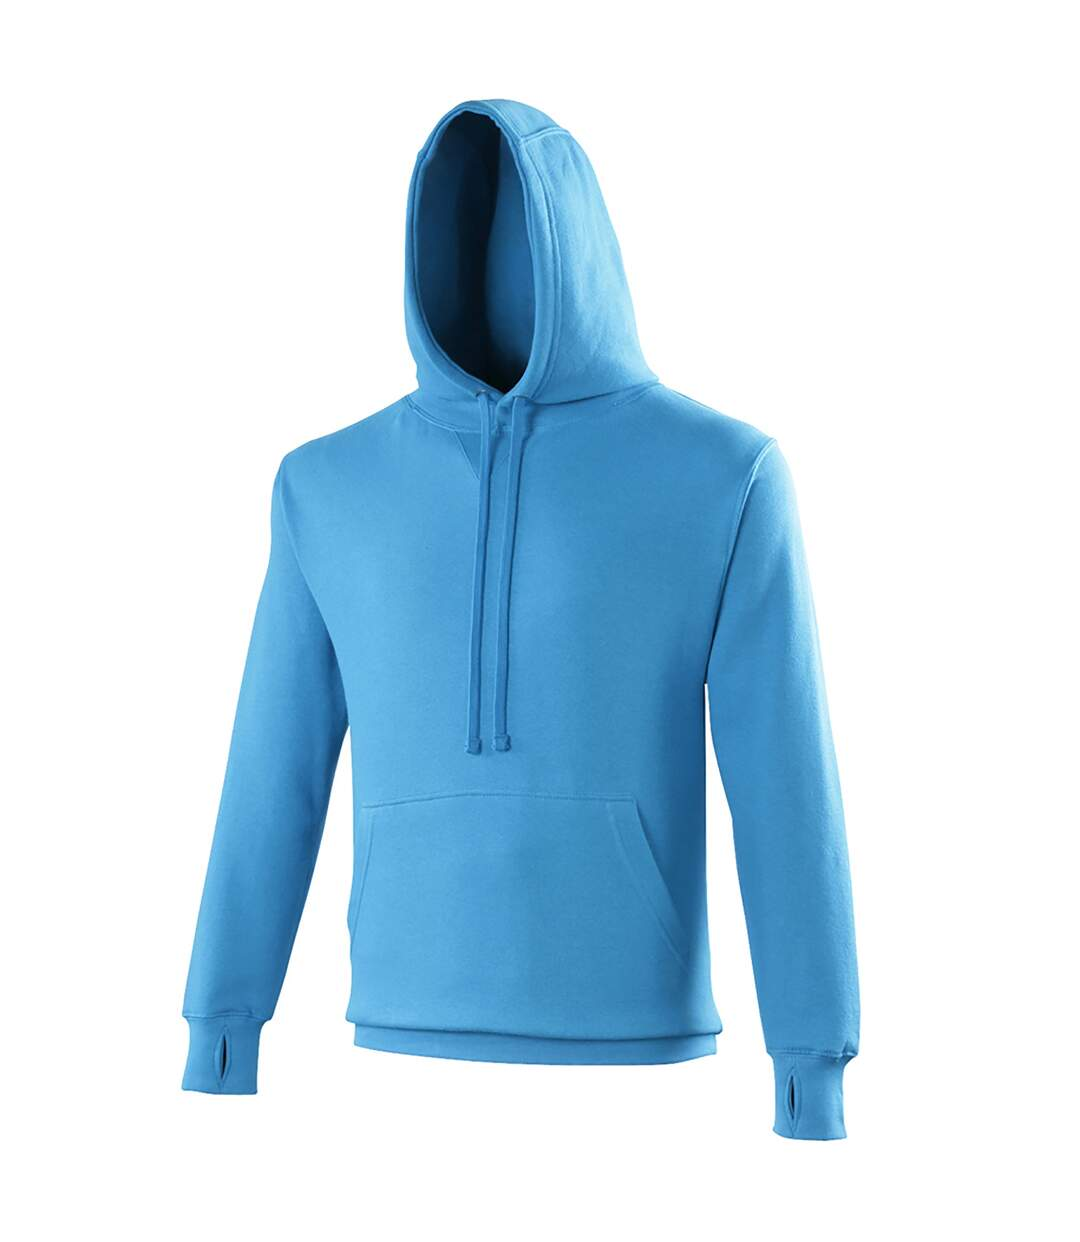 Awdis Mens Street Hooded Sweatshirt / Hoodie (Sapphire Blue) - UTRW170